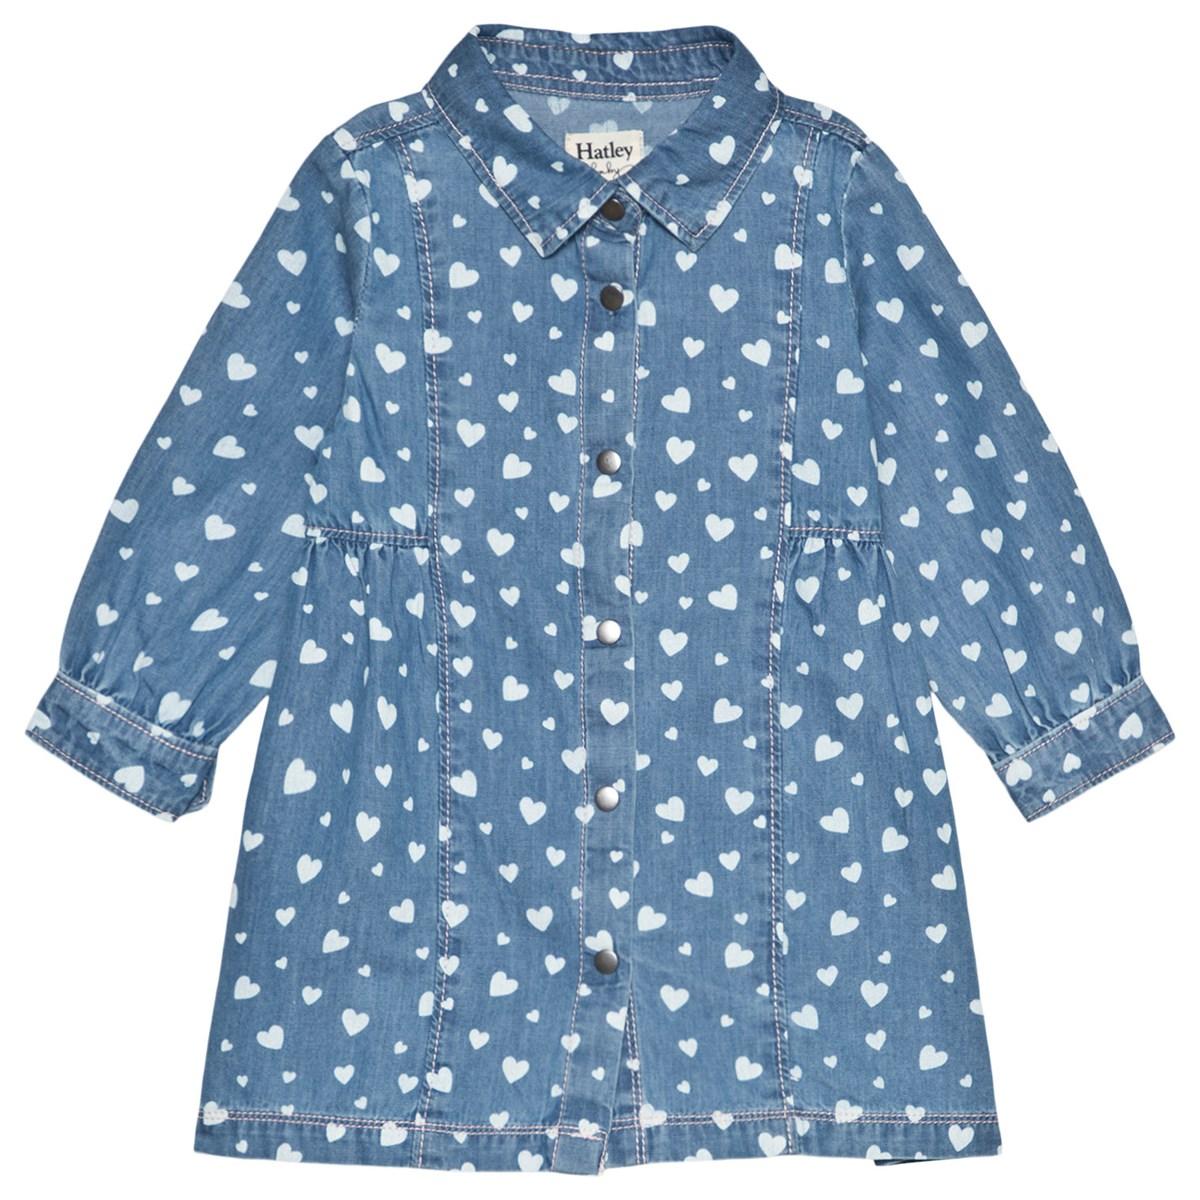 SALE £29.60 Hatley Heart Cluster Baby Denim Dress (was £37)